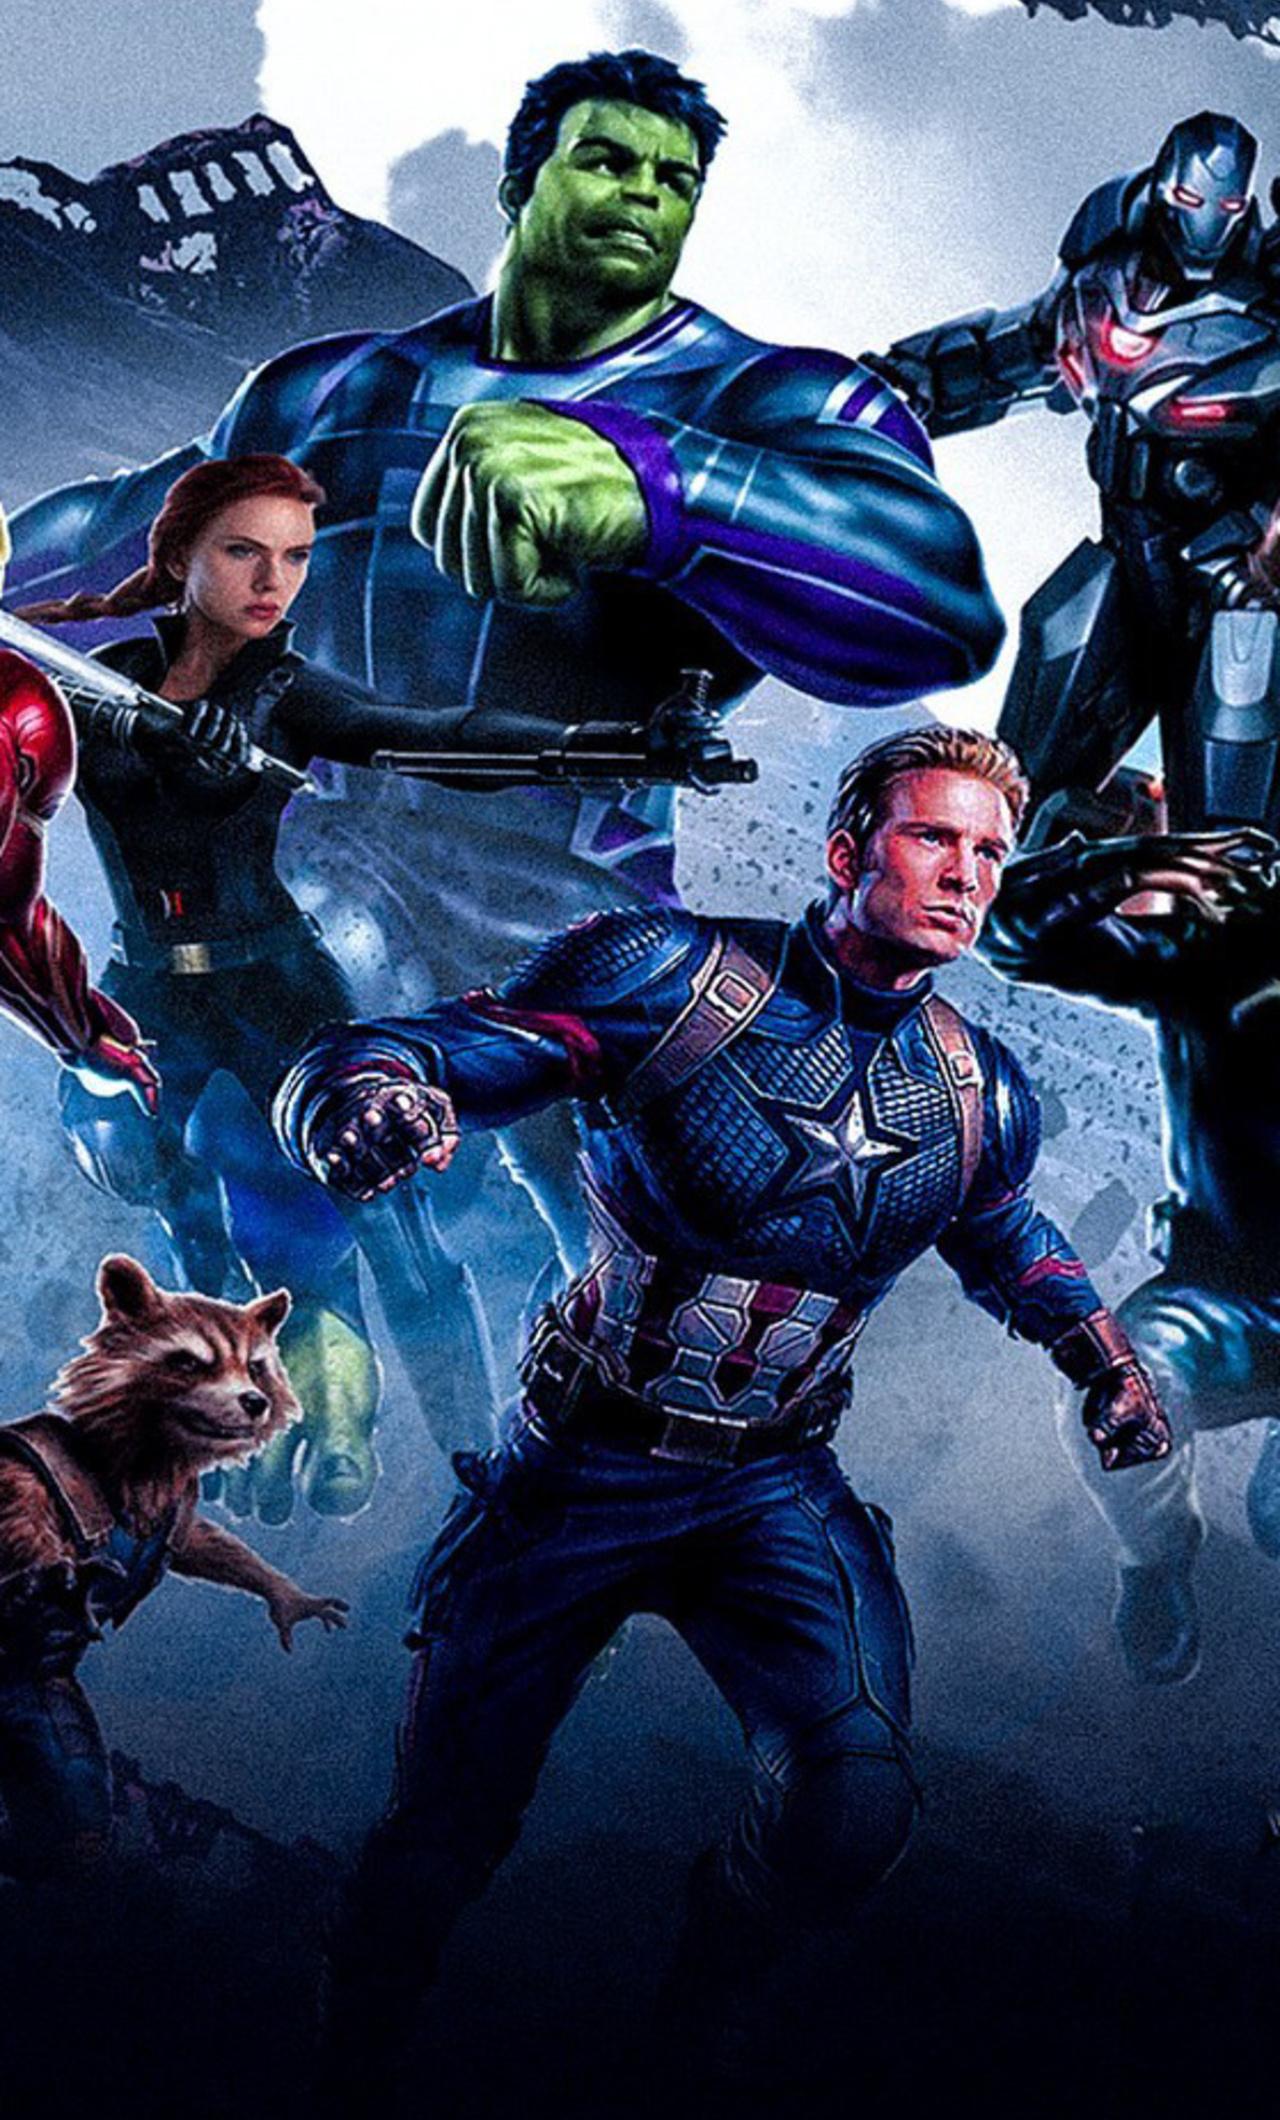 1280x2120 Avengers Endgame Poster iPhone 6+ HD 4k ...